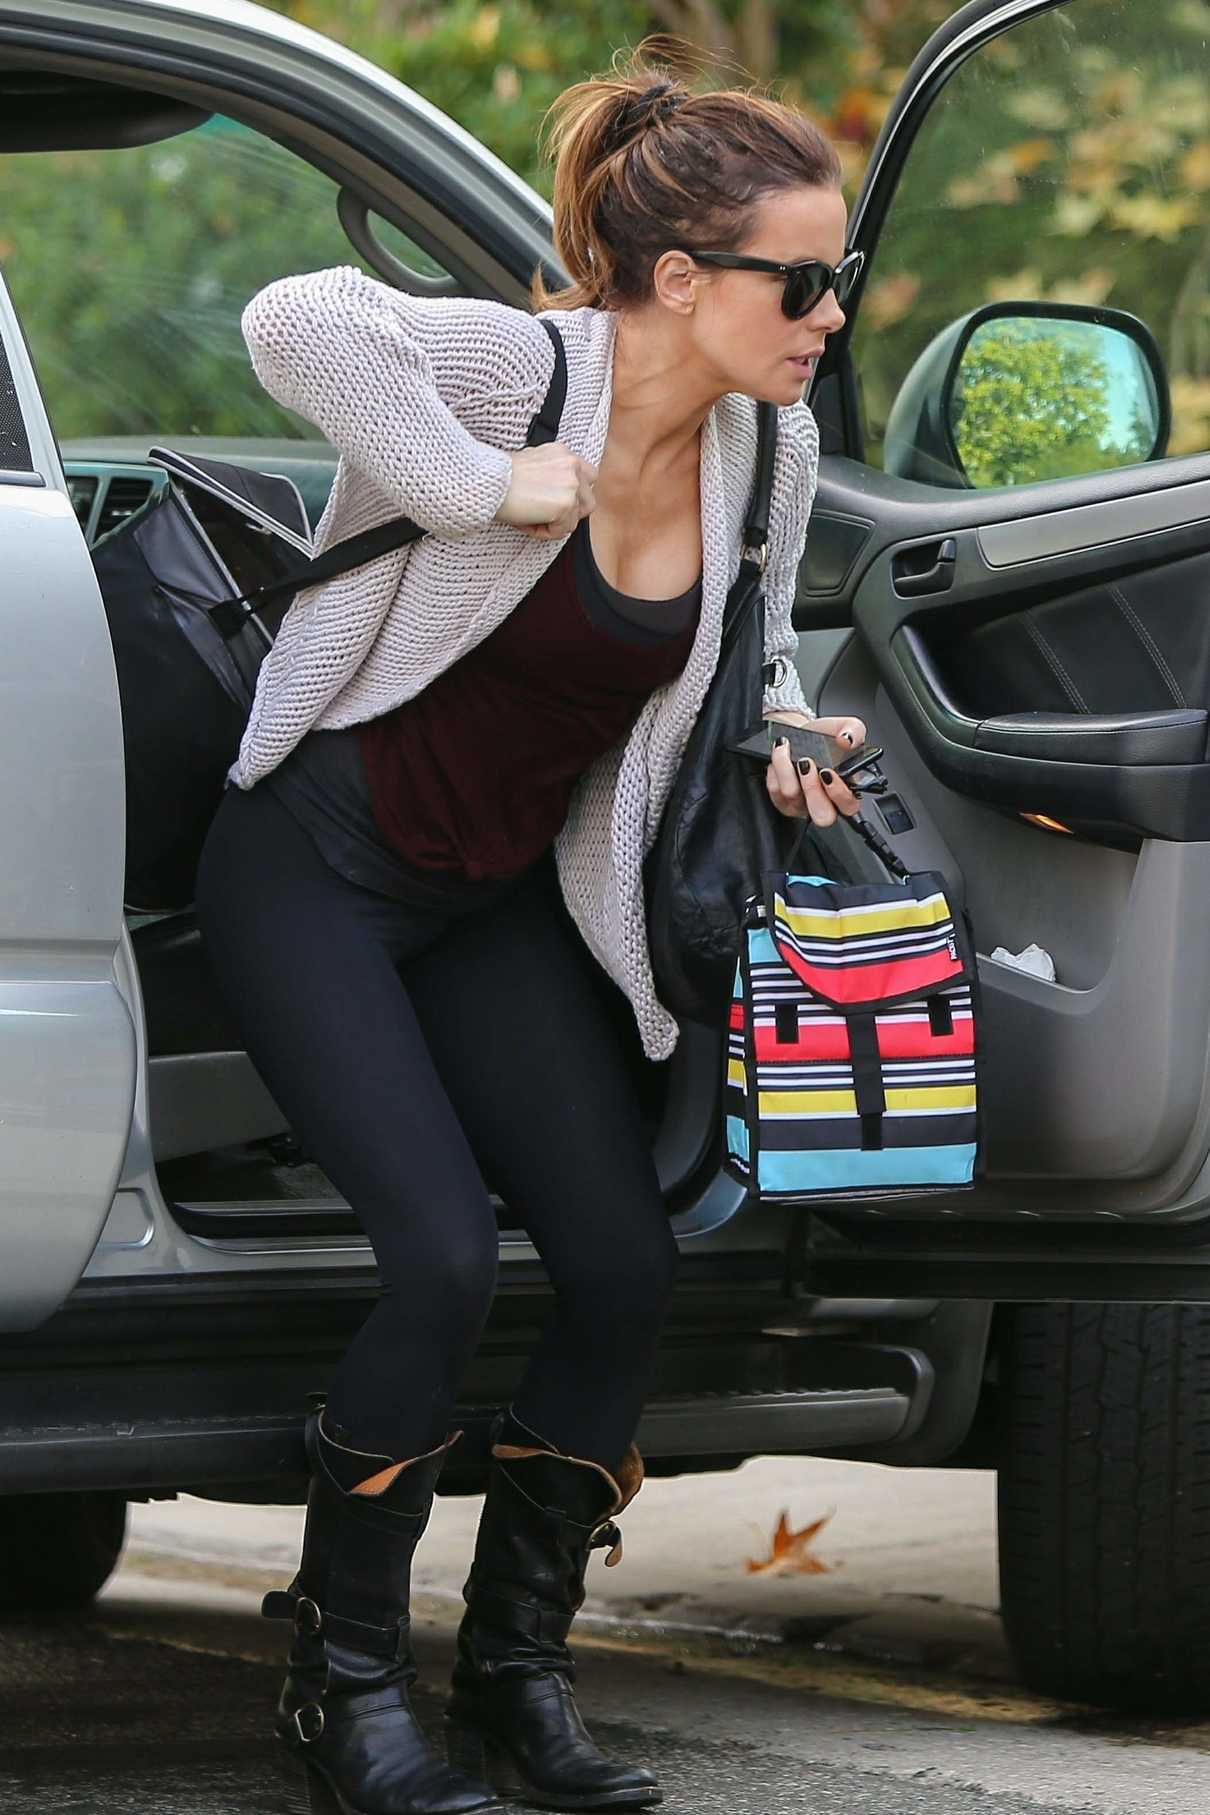 Kate Beckinsale in a Black Leggings Was Seen